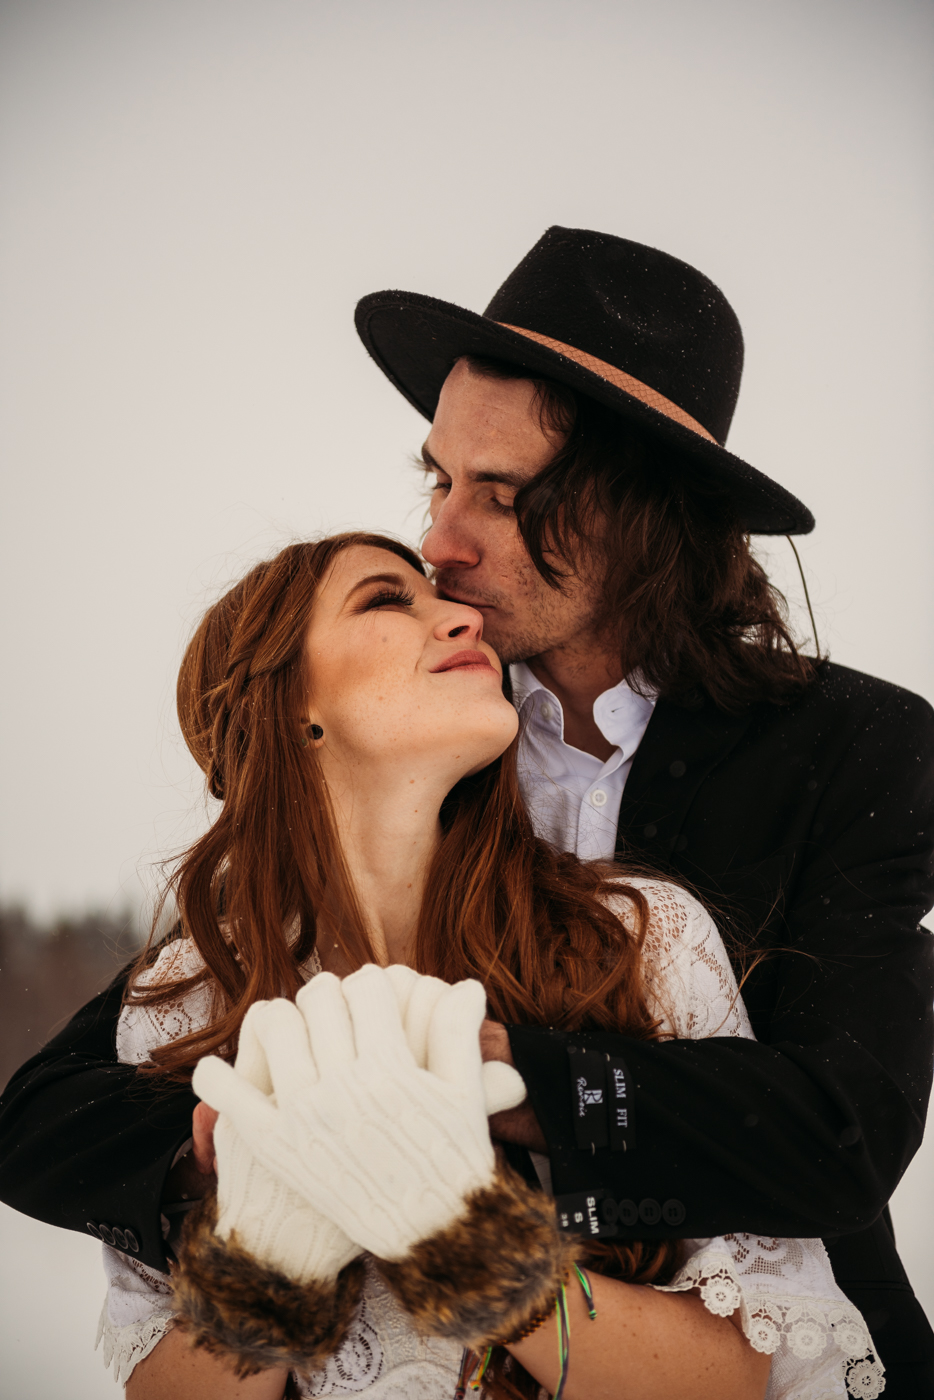 FortSt.John_photographer_TyraEPhotography_Wedding_Couple_Family_Photograhy_DawsonCreek_Elopement_Bride_Boduoir_Portraits-10.jpg